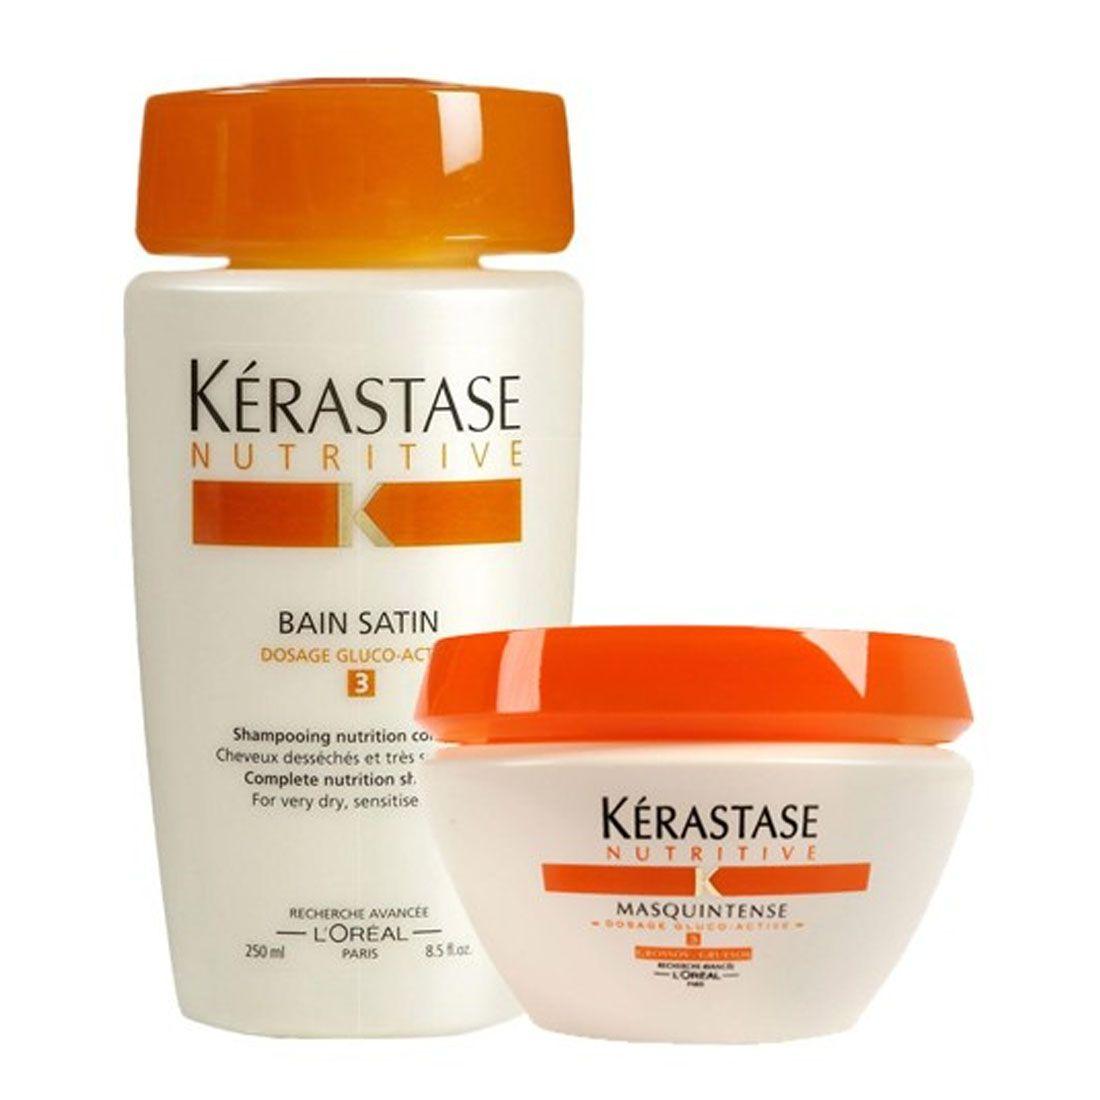 Kit Capilar Kérastase Nutritive Masquintense